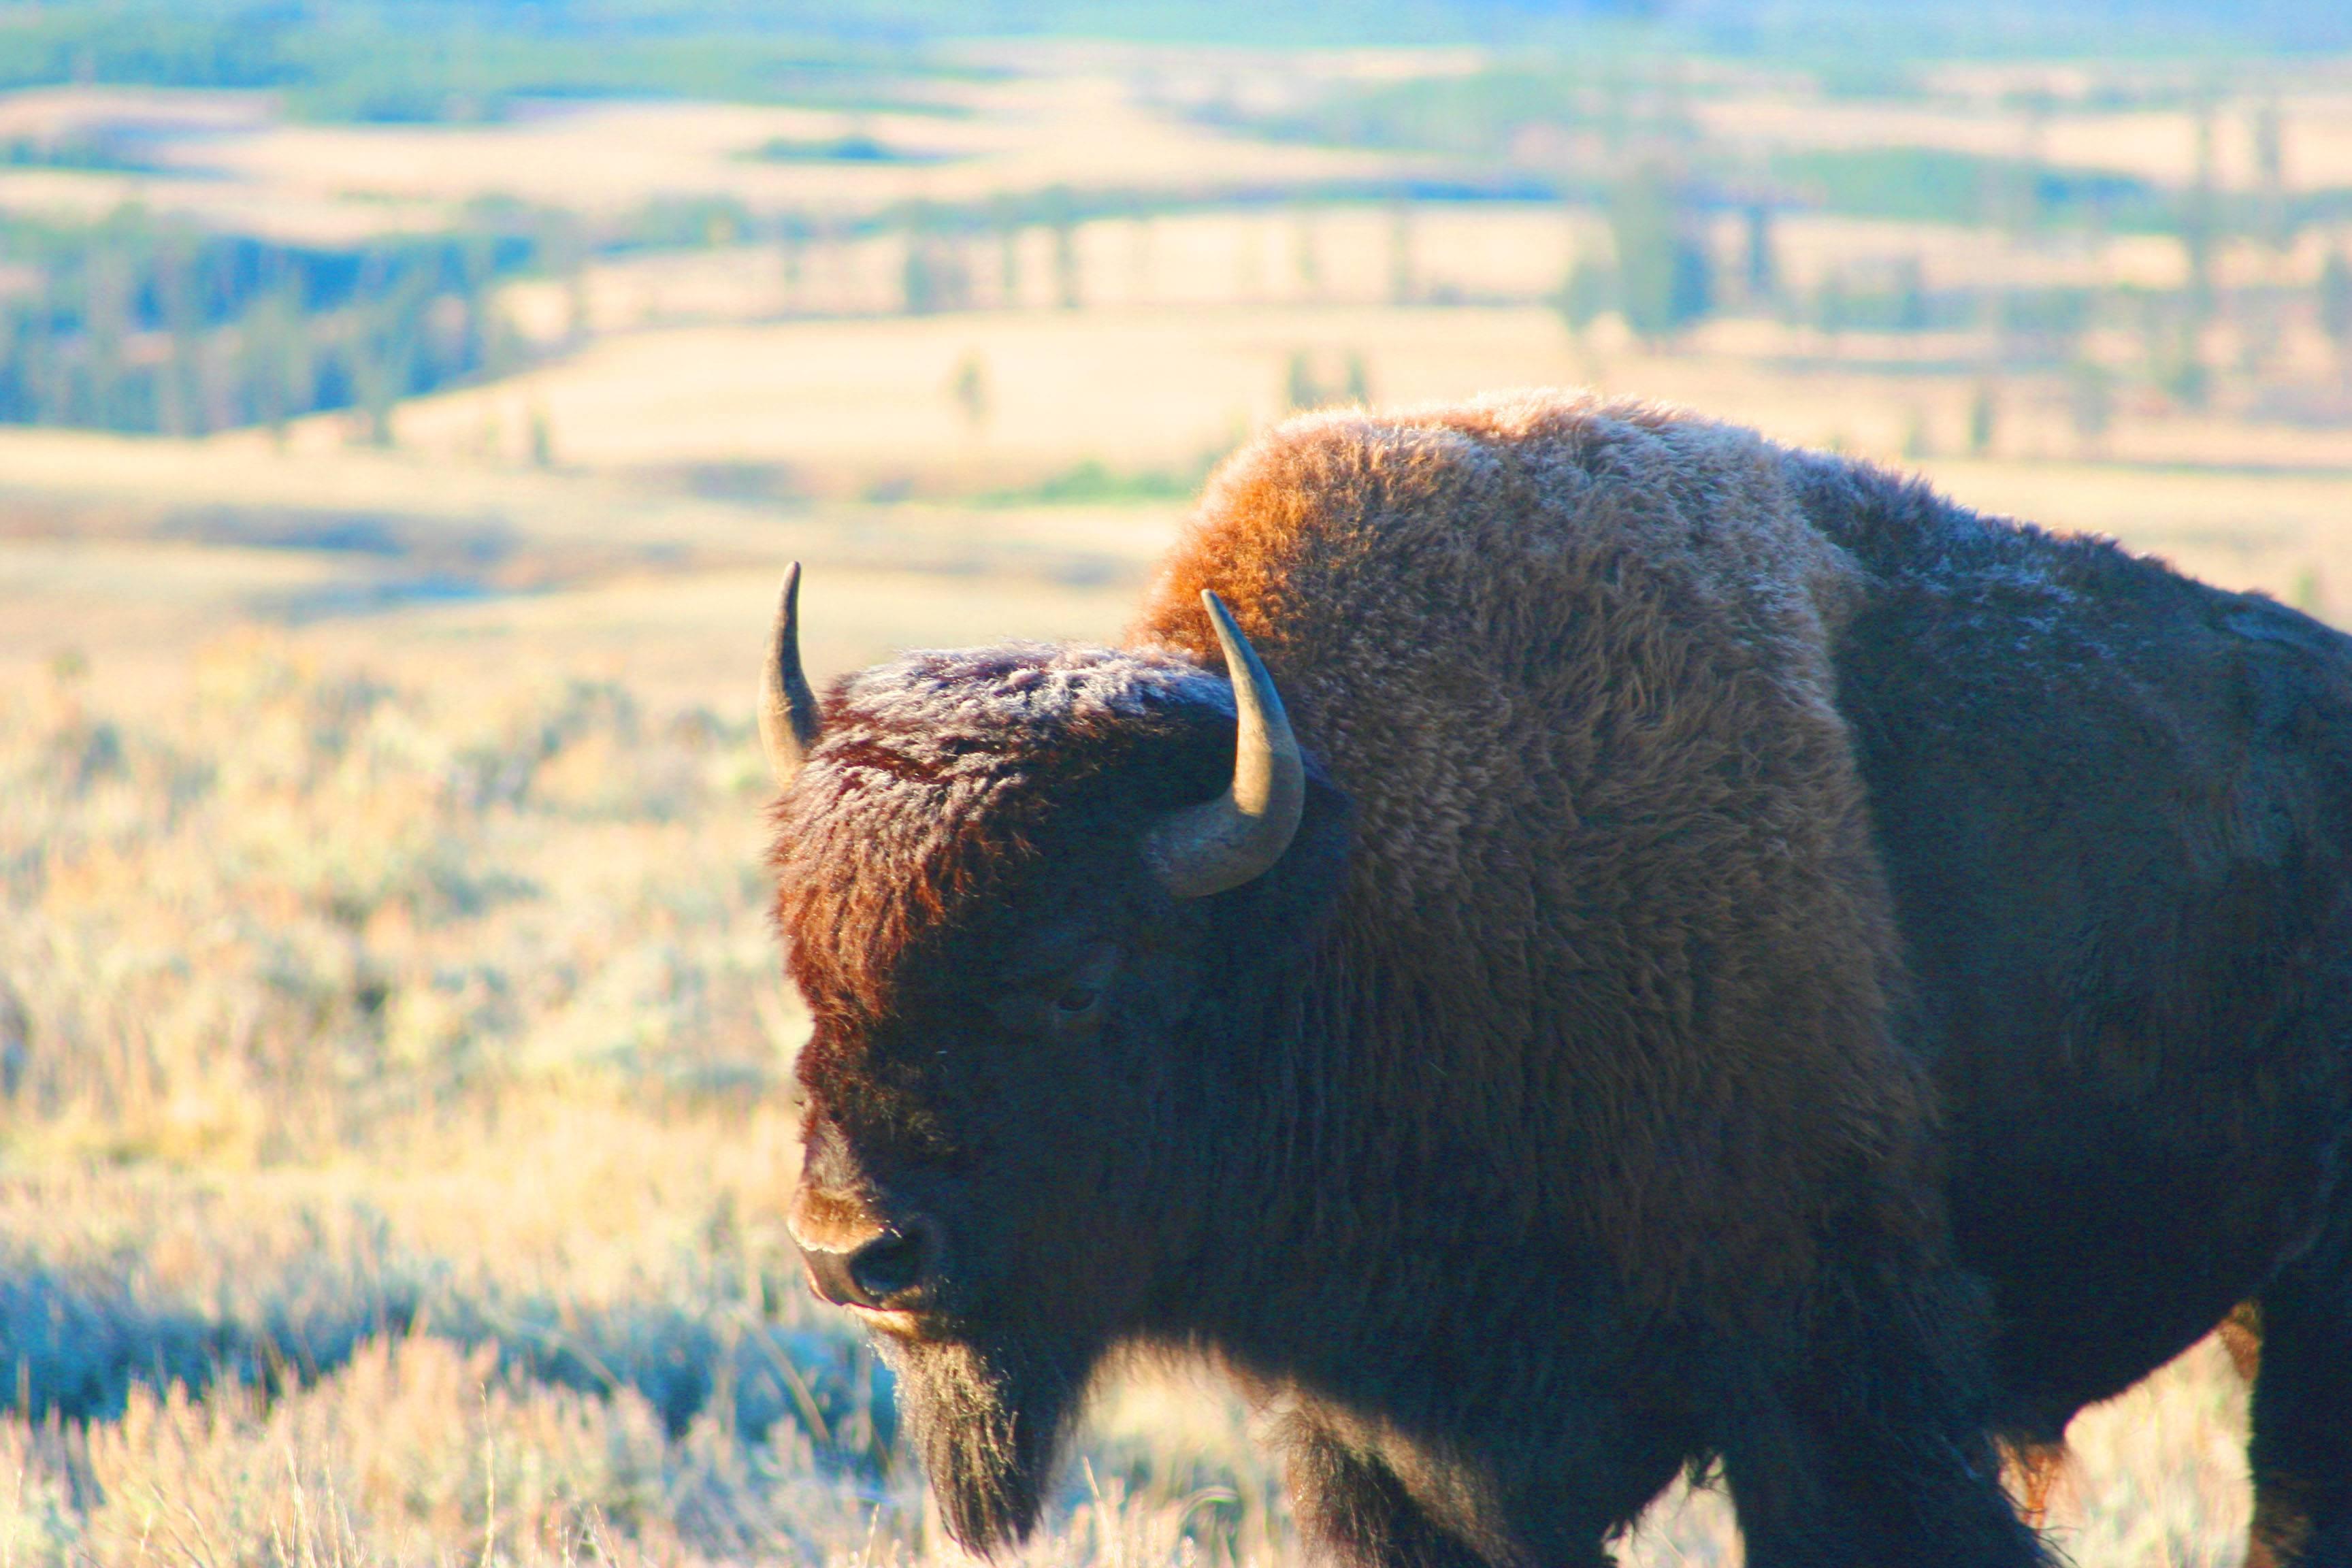 Photo 3: Yellowstone National Parc